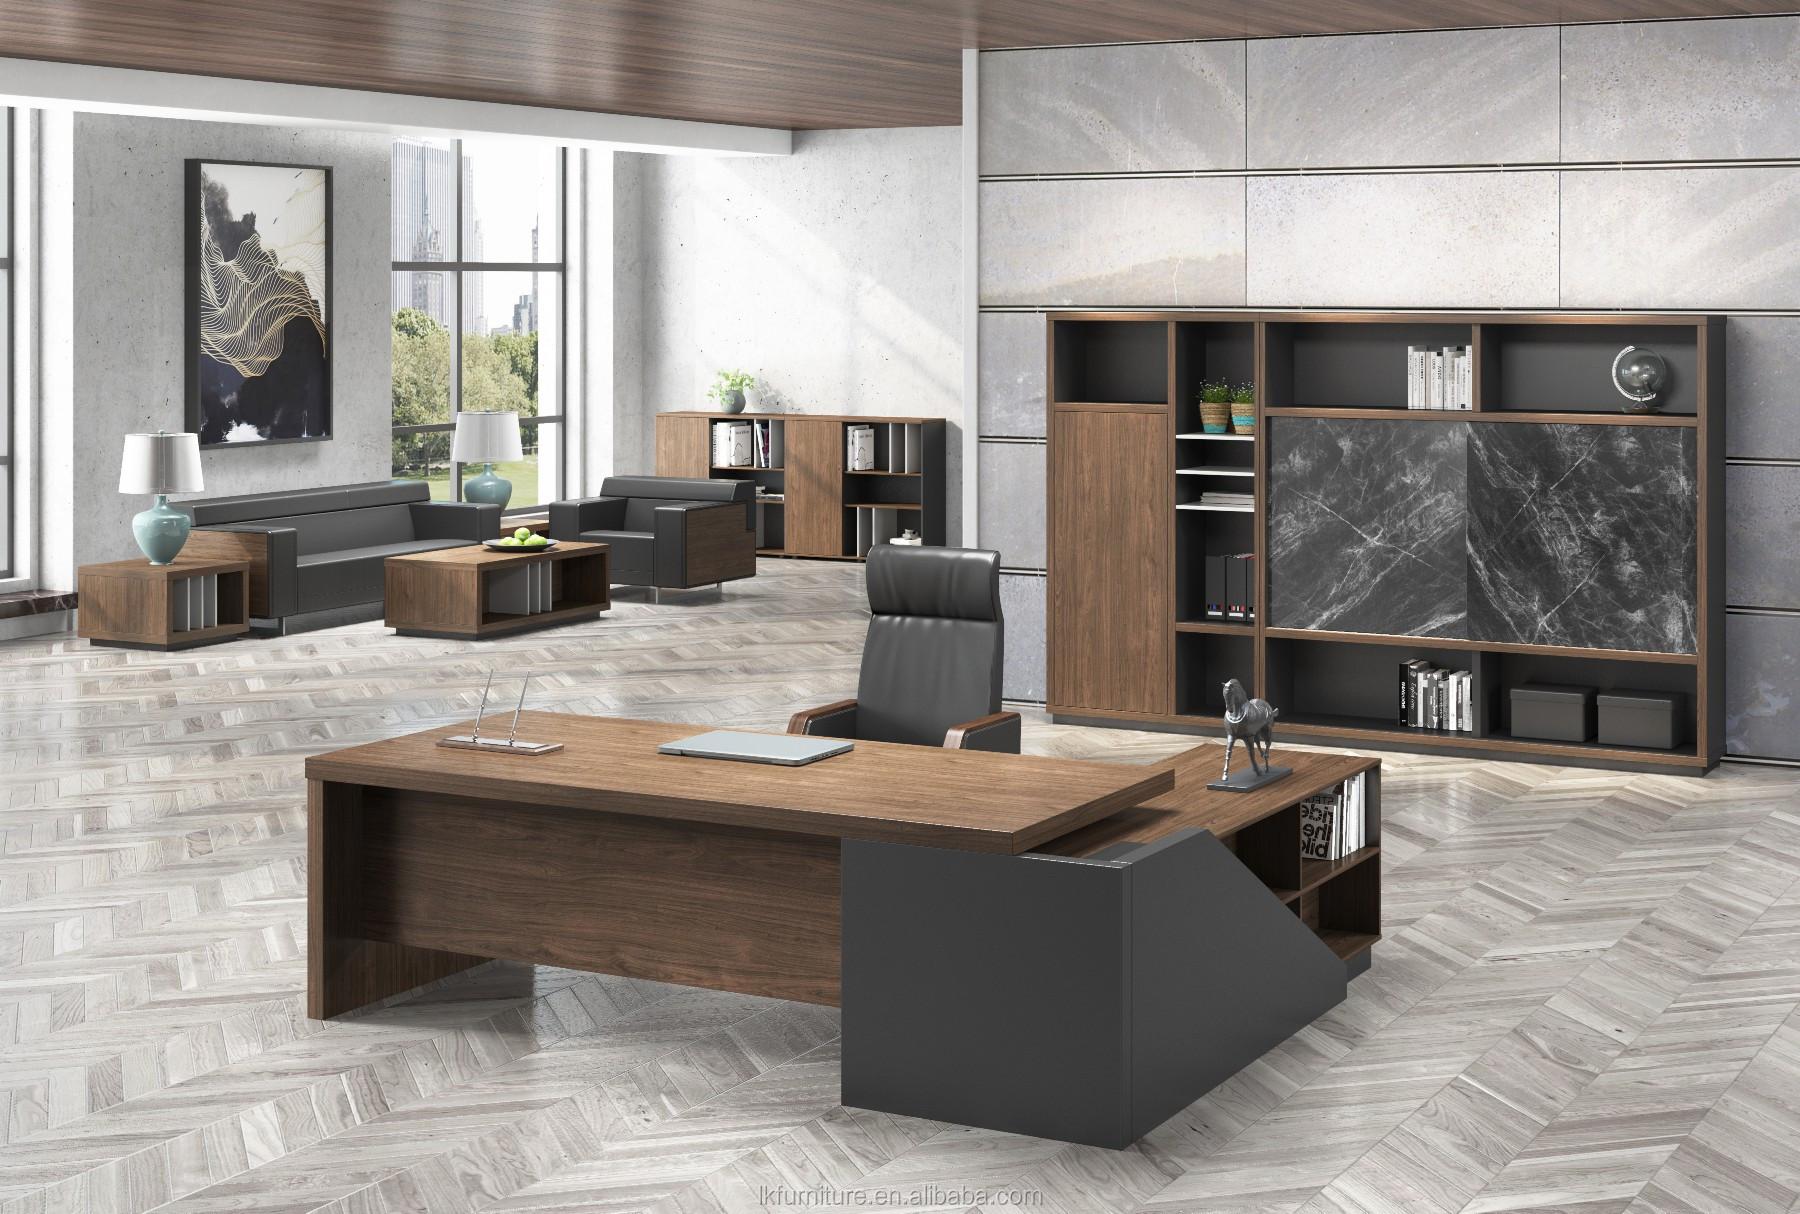 Luxury Ceo Work Desk Office Desk Table For Executive Or Director - Buy  Modern Executive Desk Office Table Design,Executive Office Table  Design,Office ...